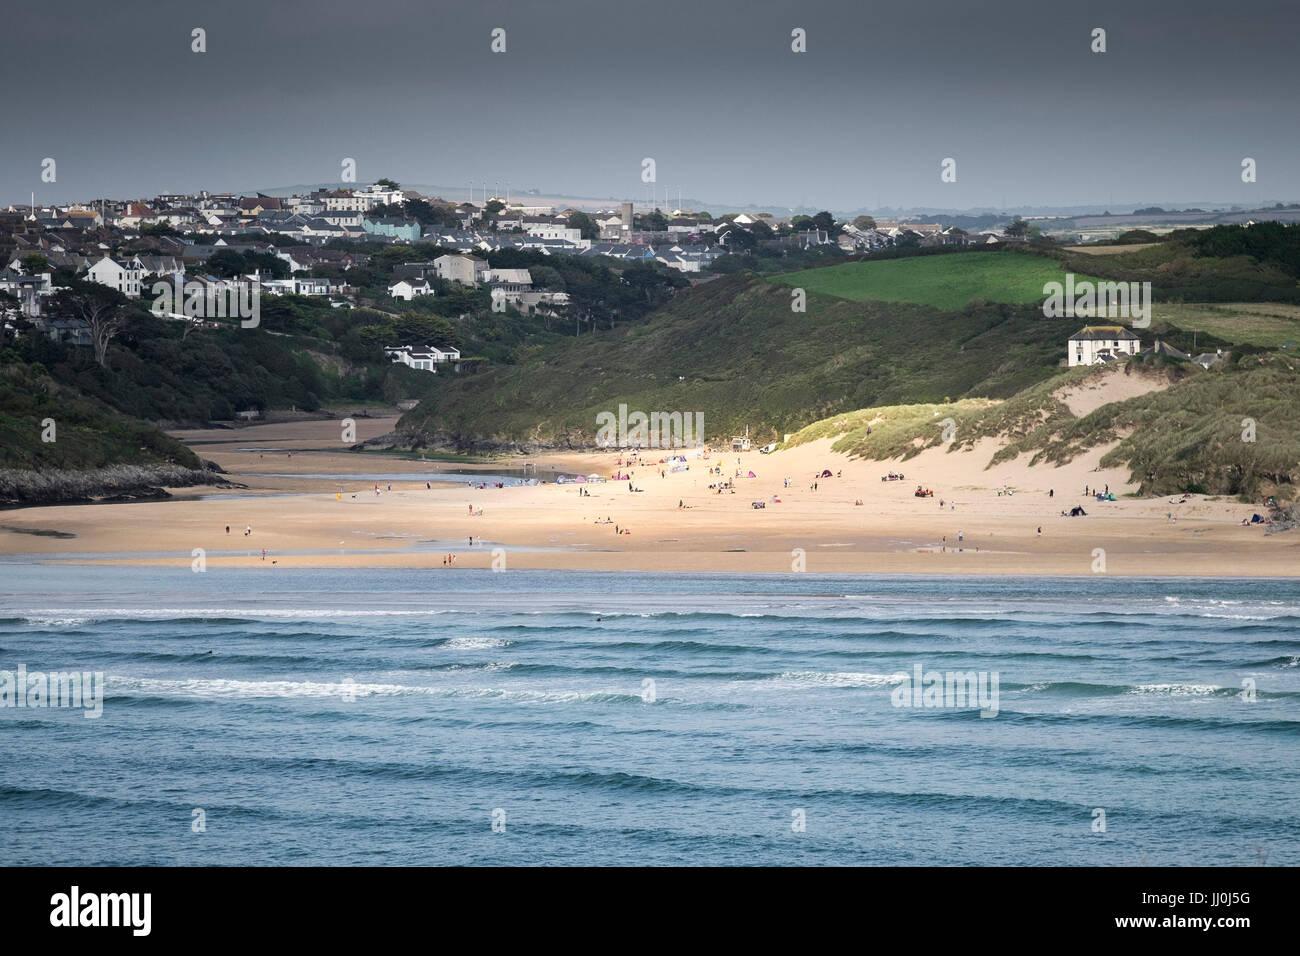 Sunlight shining on Crantock Beach seen from West Pentire Headland. - Stock Image